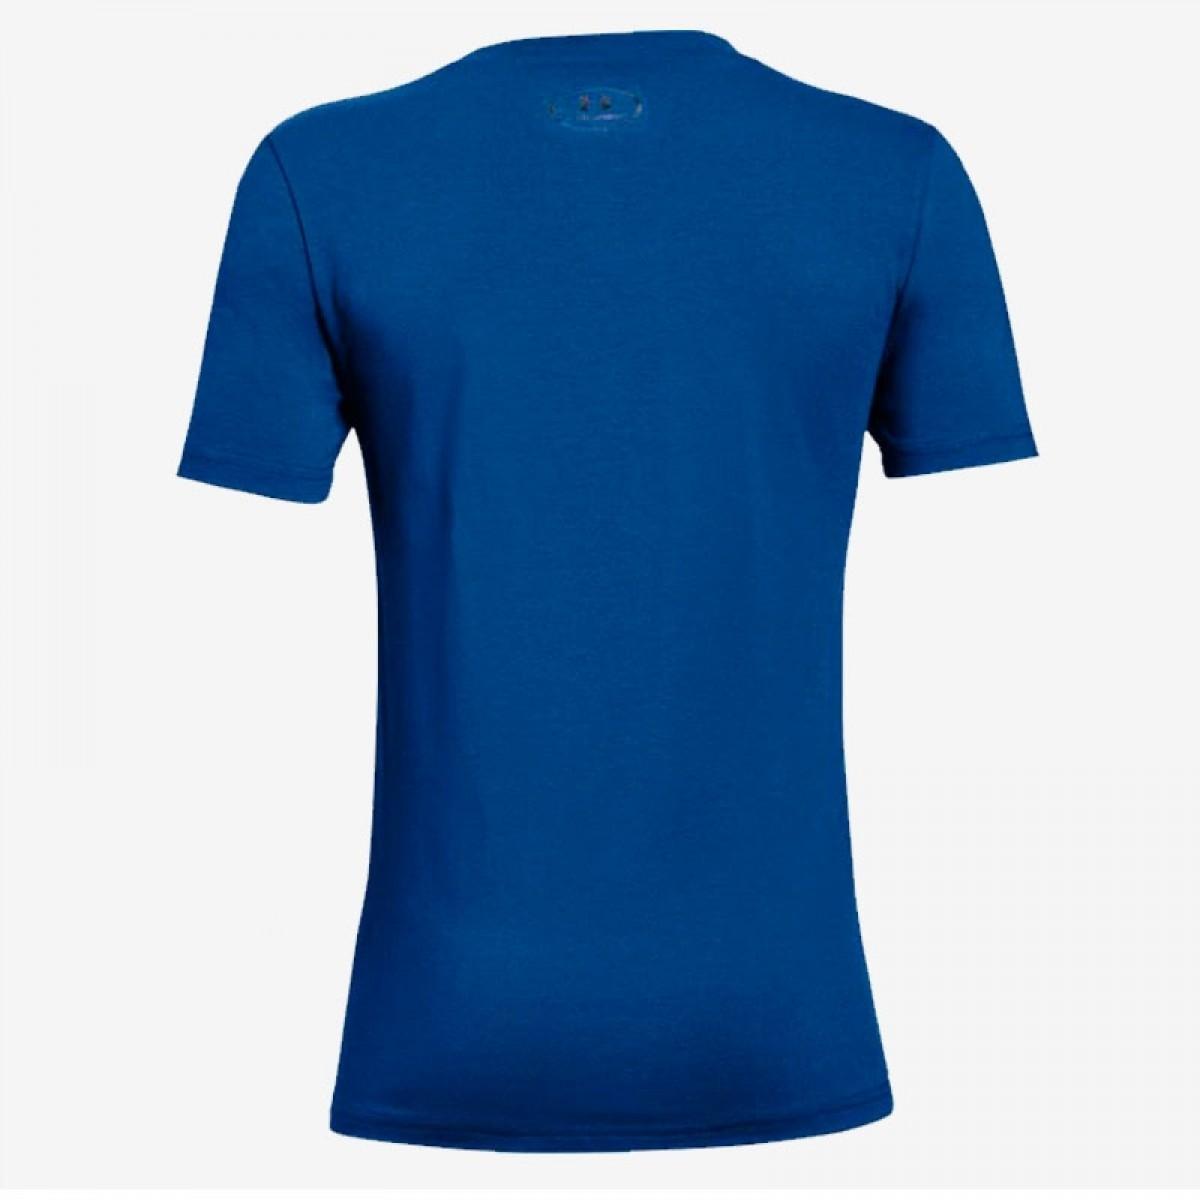 UA SC30 Player Jr Tee 'Blue' 1323434-400